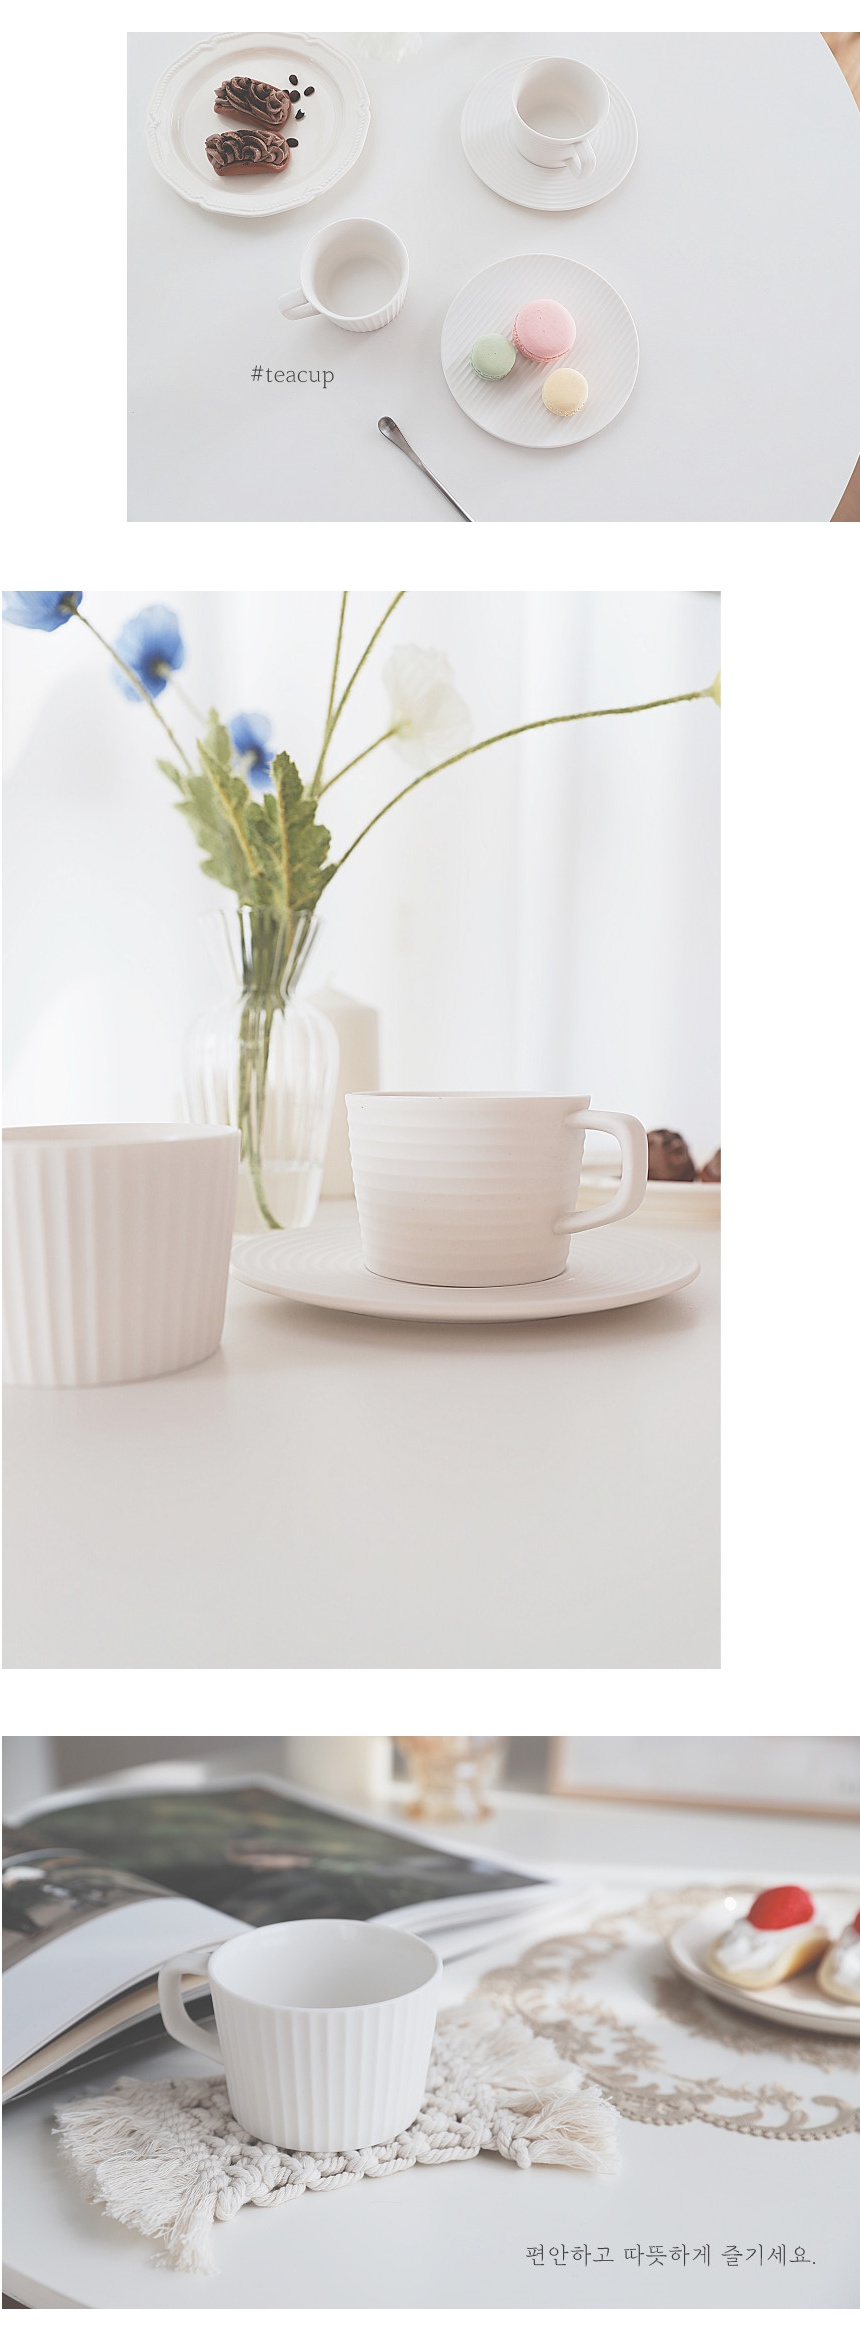 white_basic_cup_04.jpg